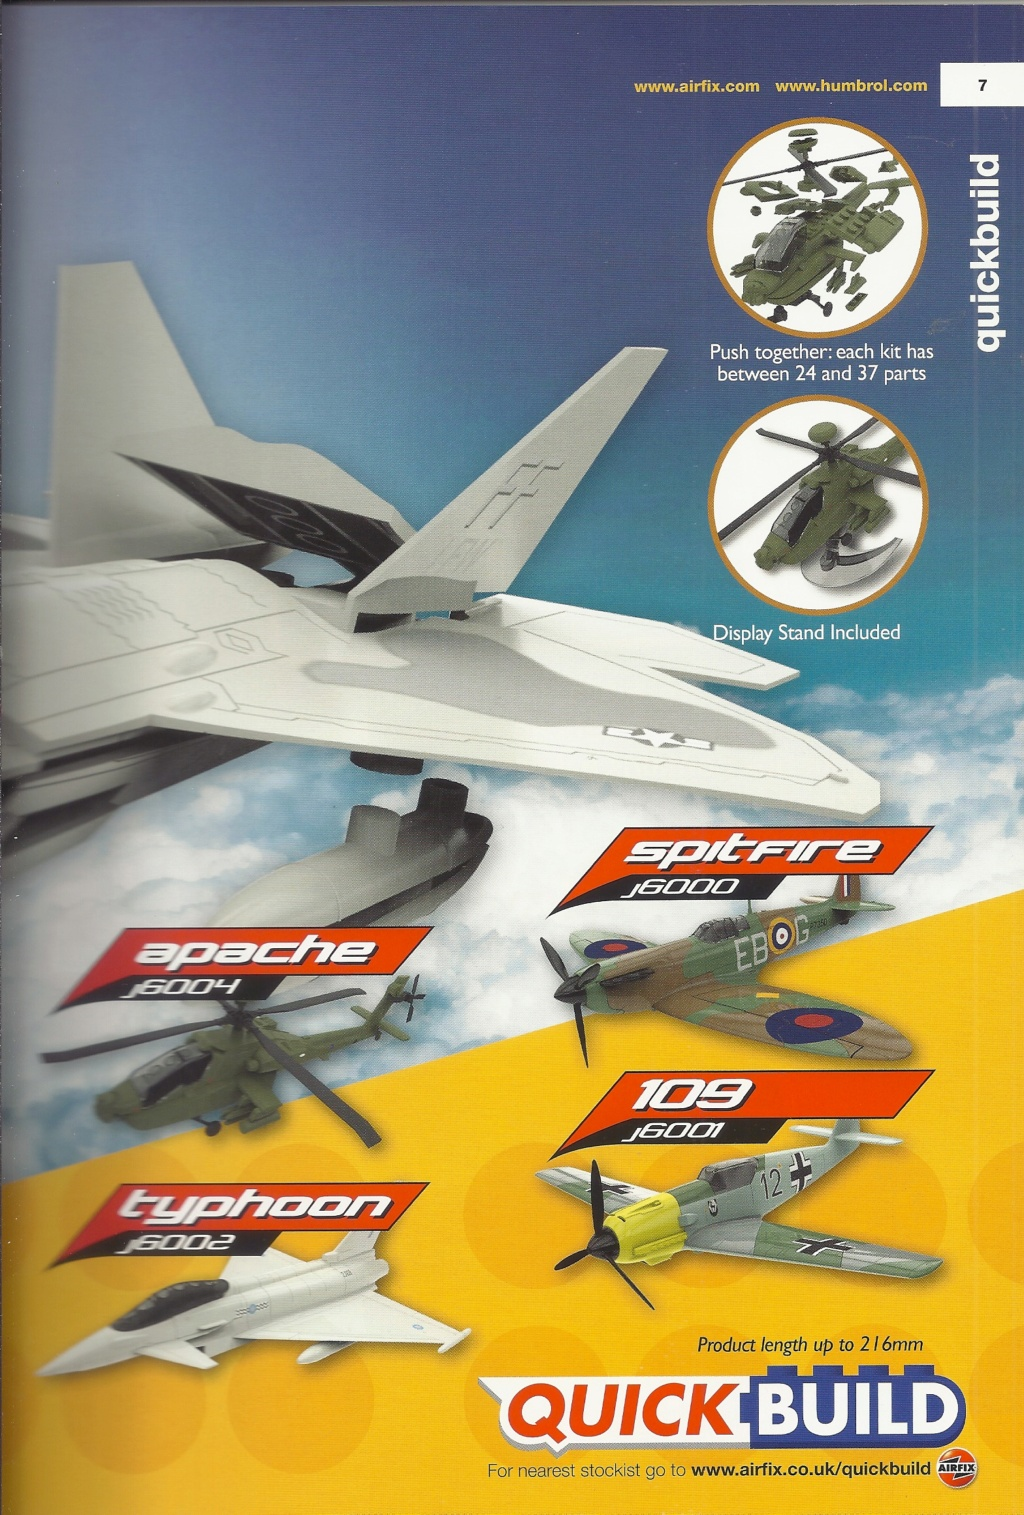 [AIRFIX 2013] Catalogue 2013 Airf1405